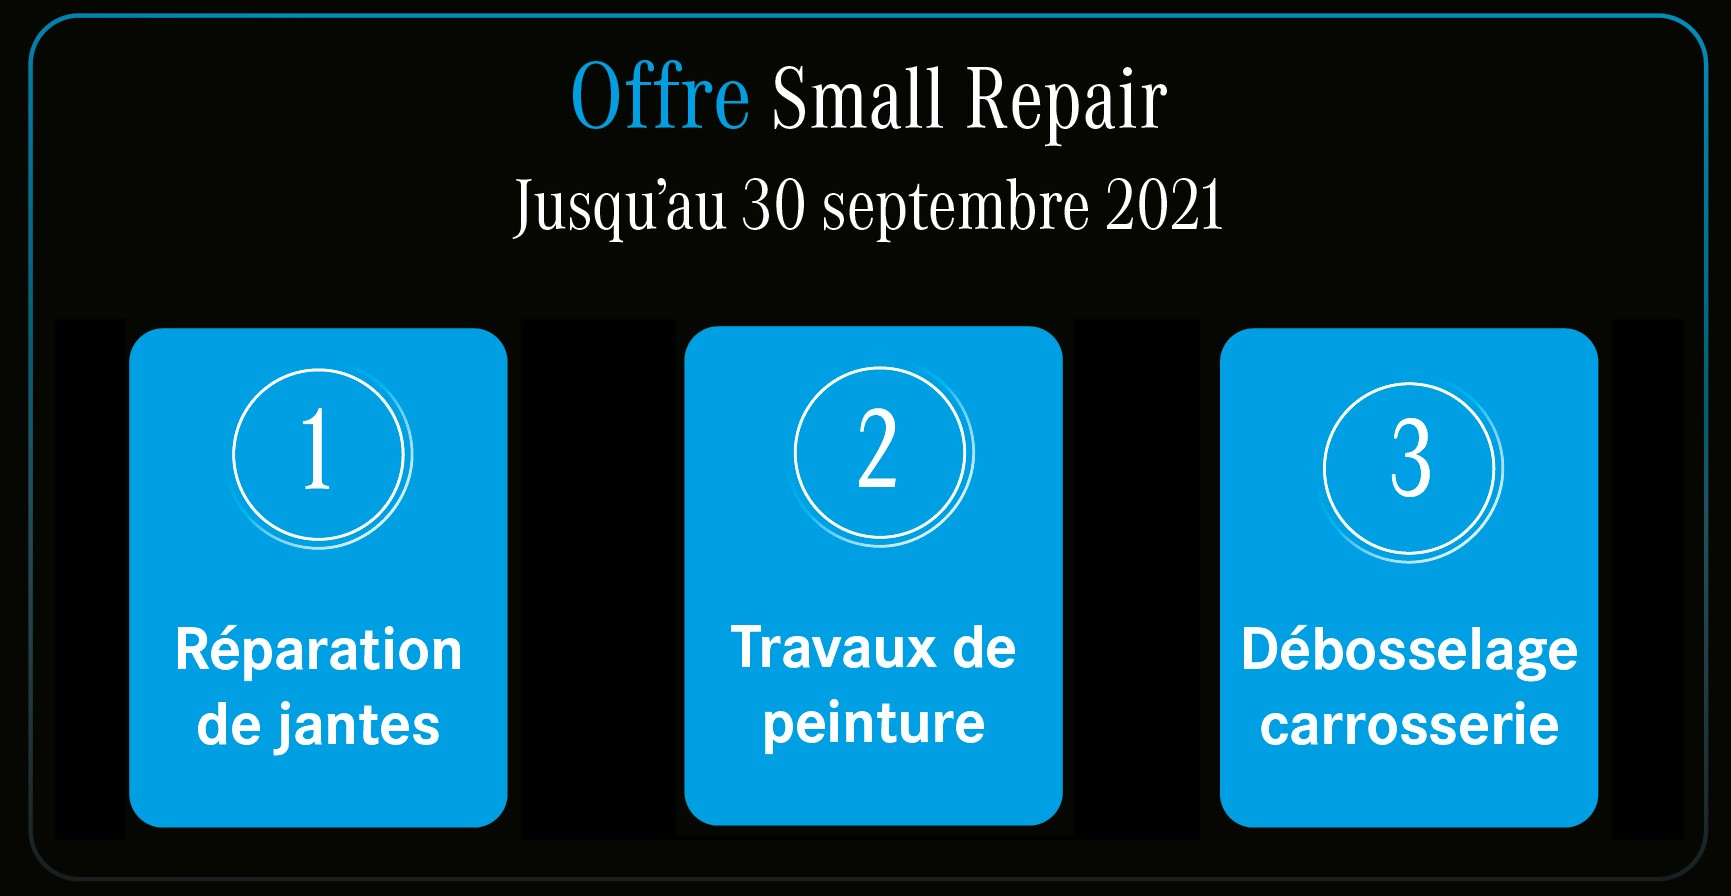 Offre small repair Mercedes-Benz